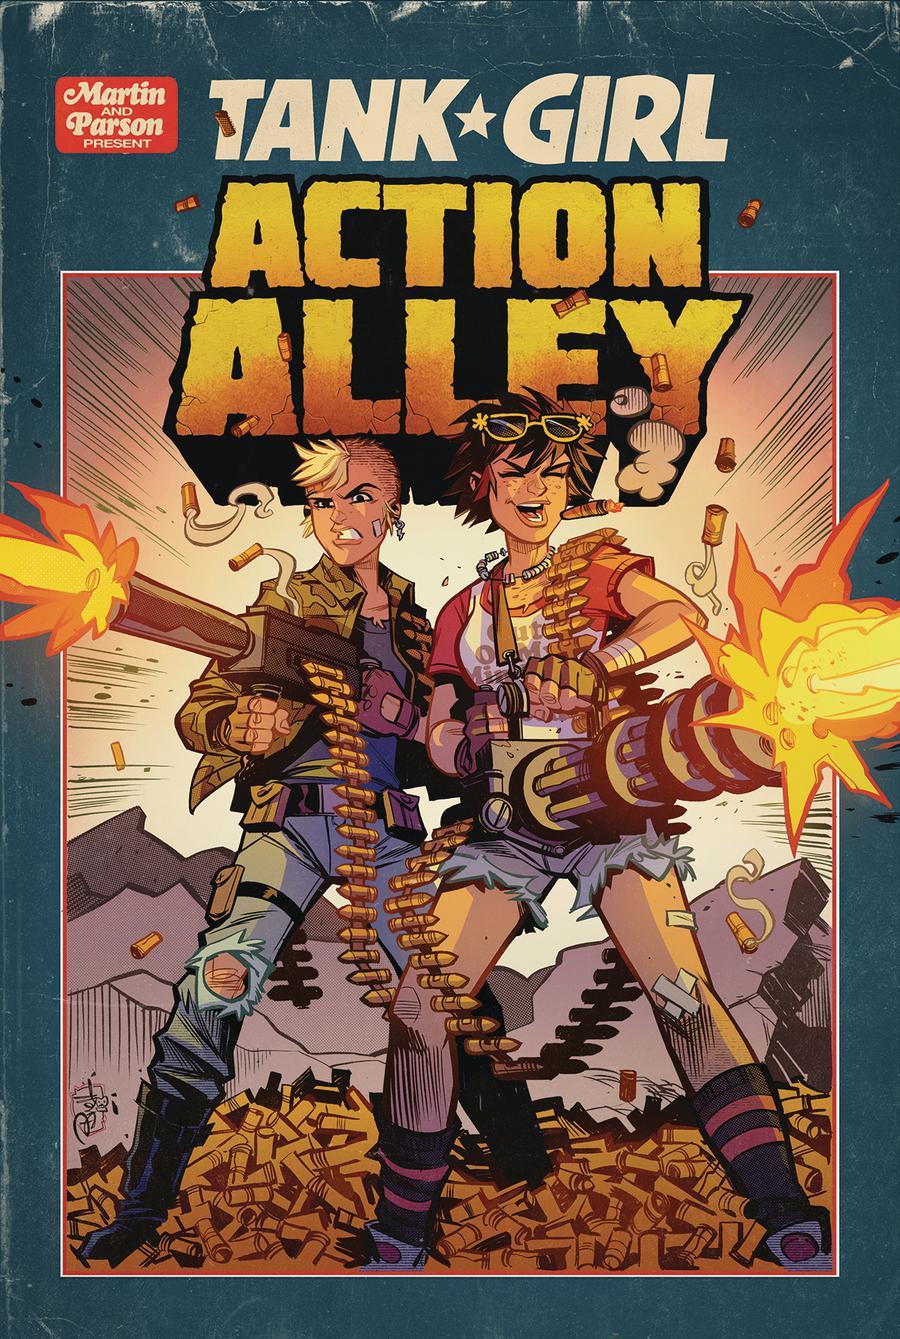 Tank Girl Vol 3 #3 Action Alley Cover A Regular Brett Parson Cover